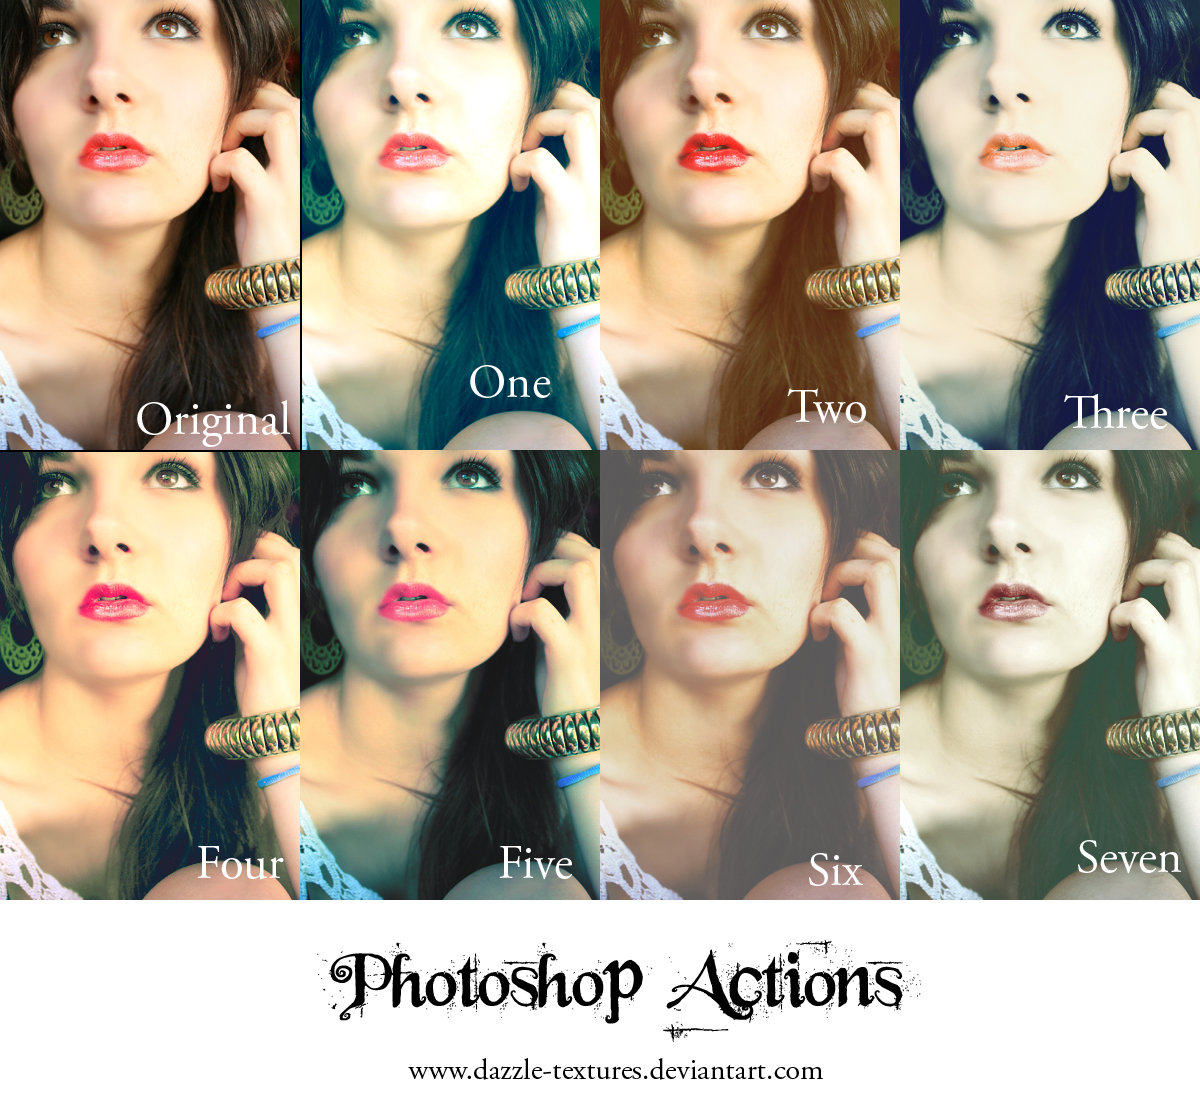 70-action-blend-mau-tu-dong-cho-photoshop-15